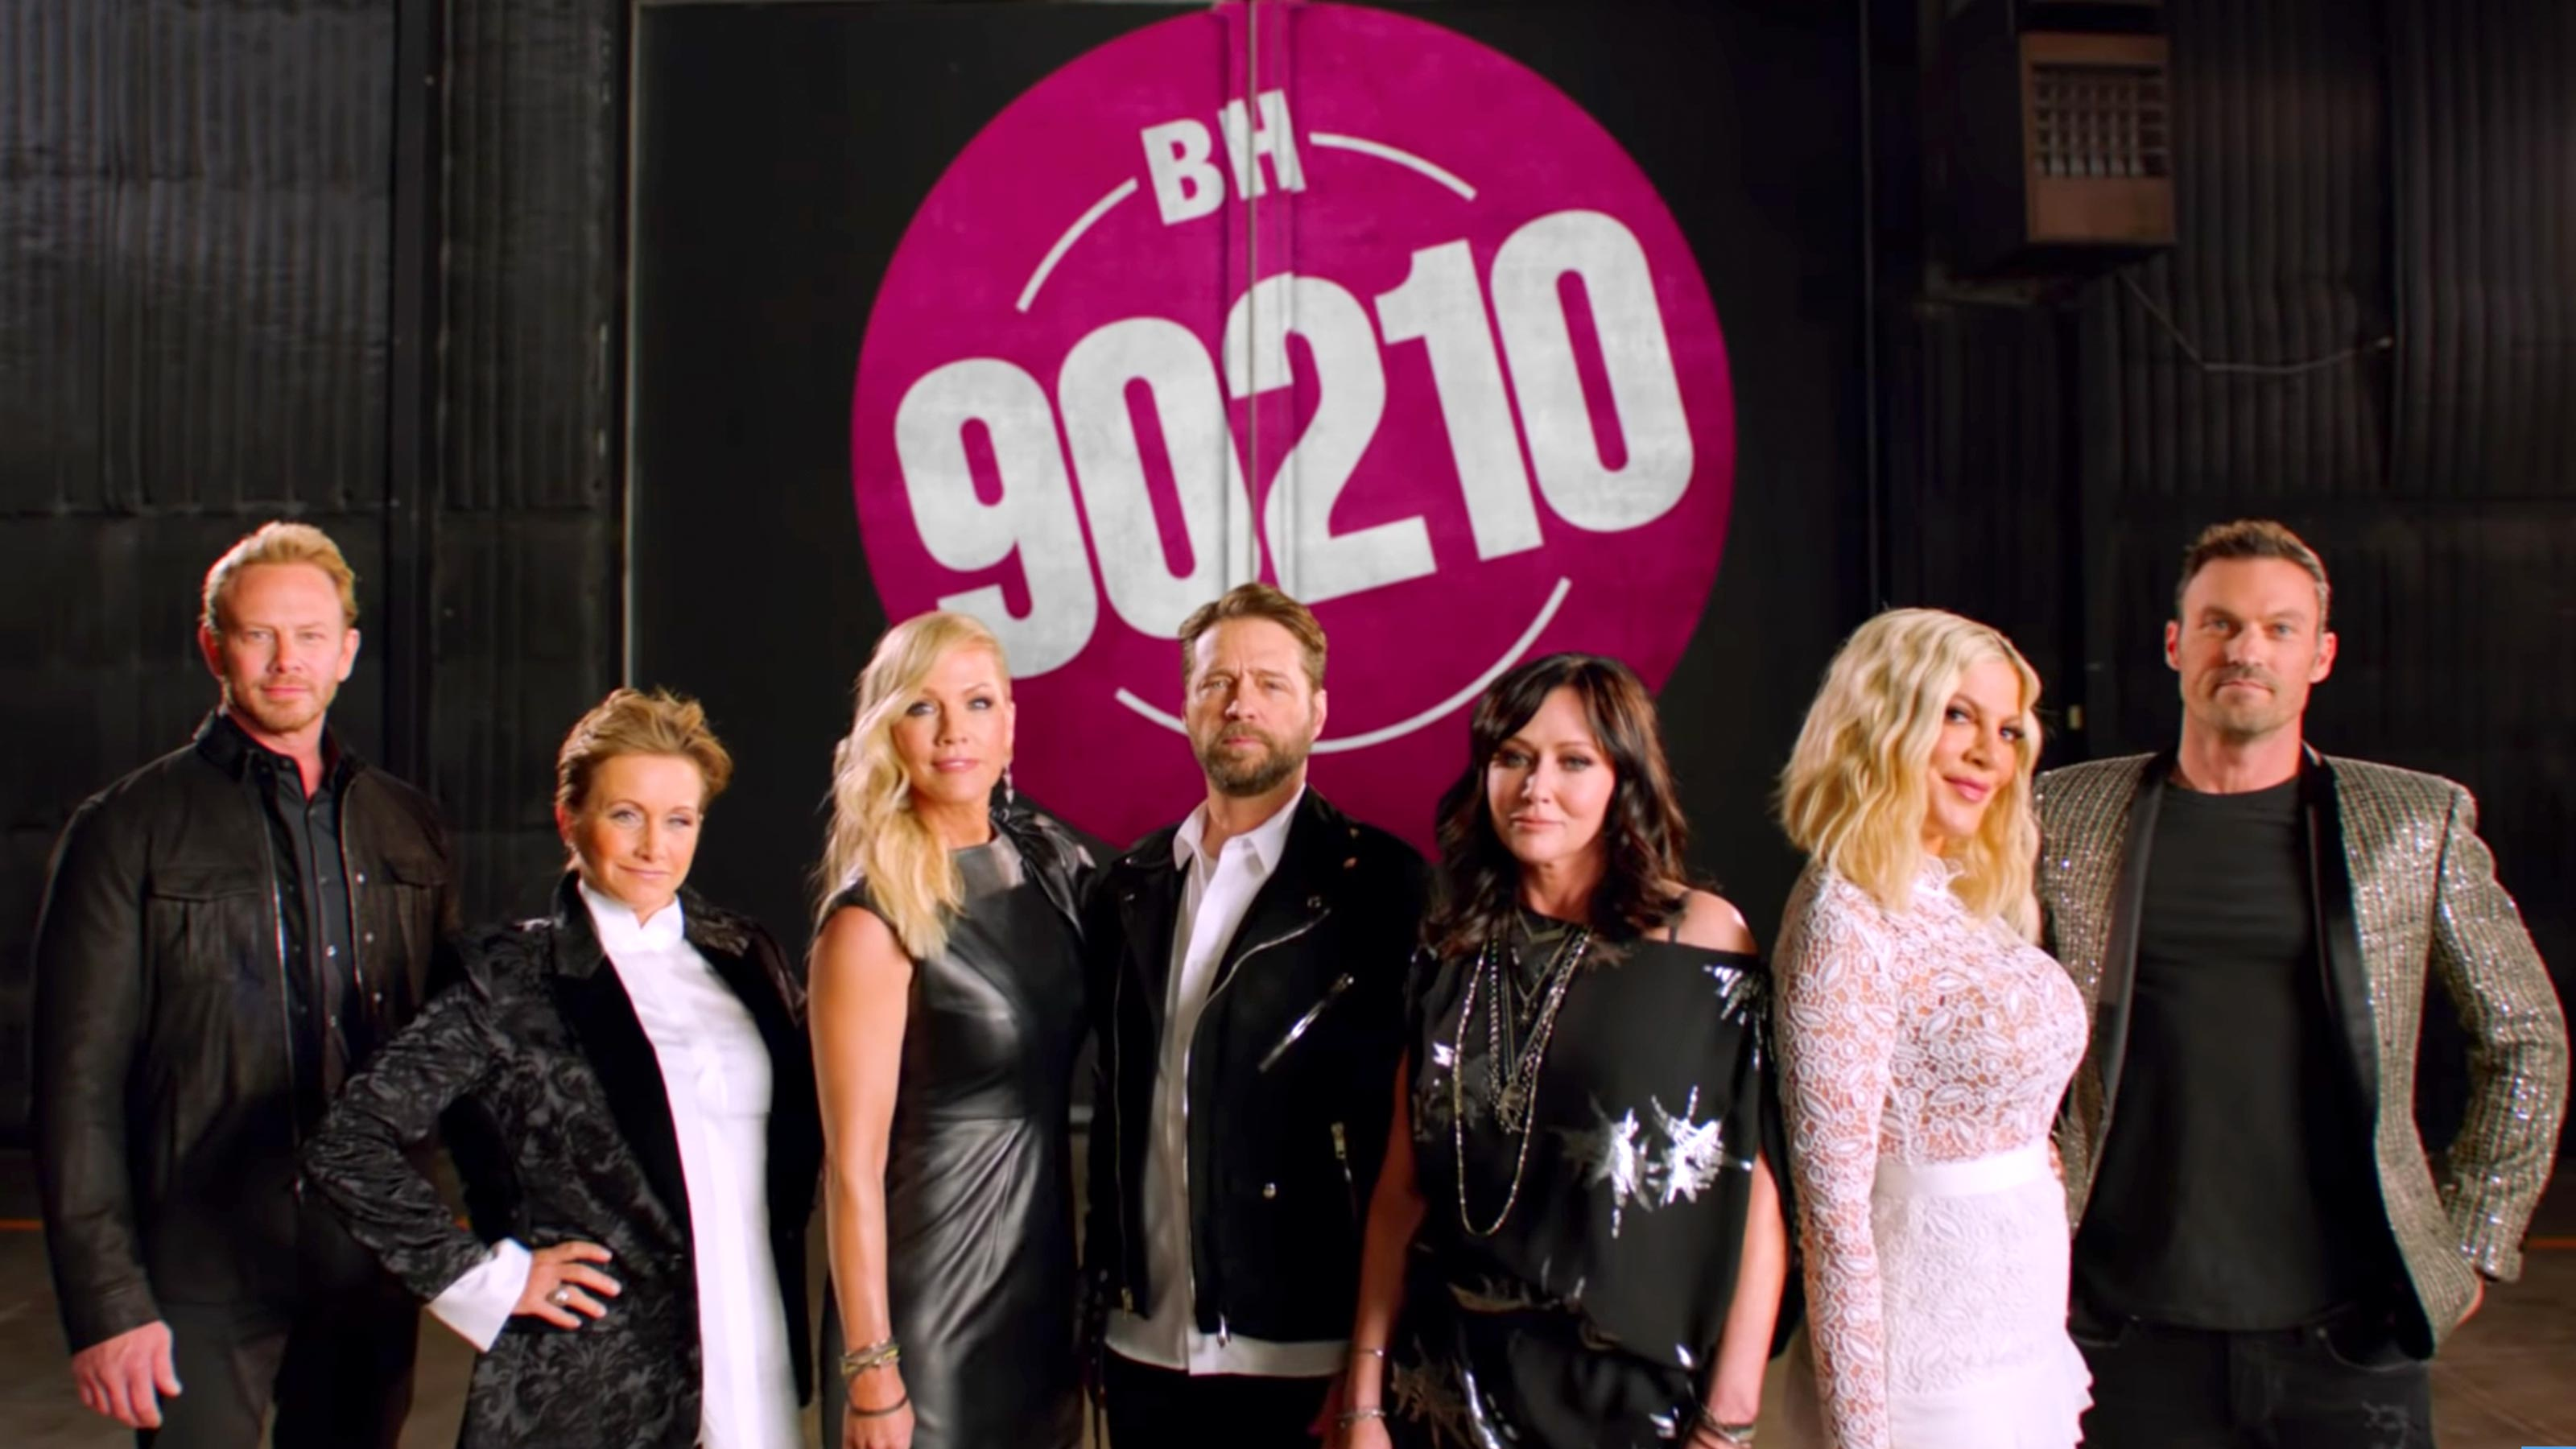 beverly hills 90210 teaser